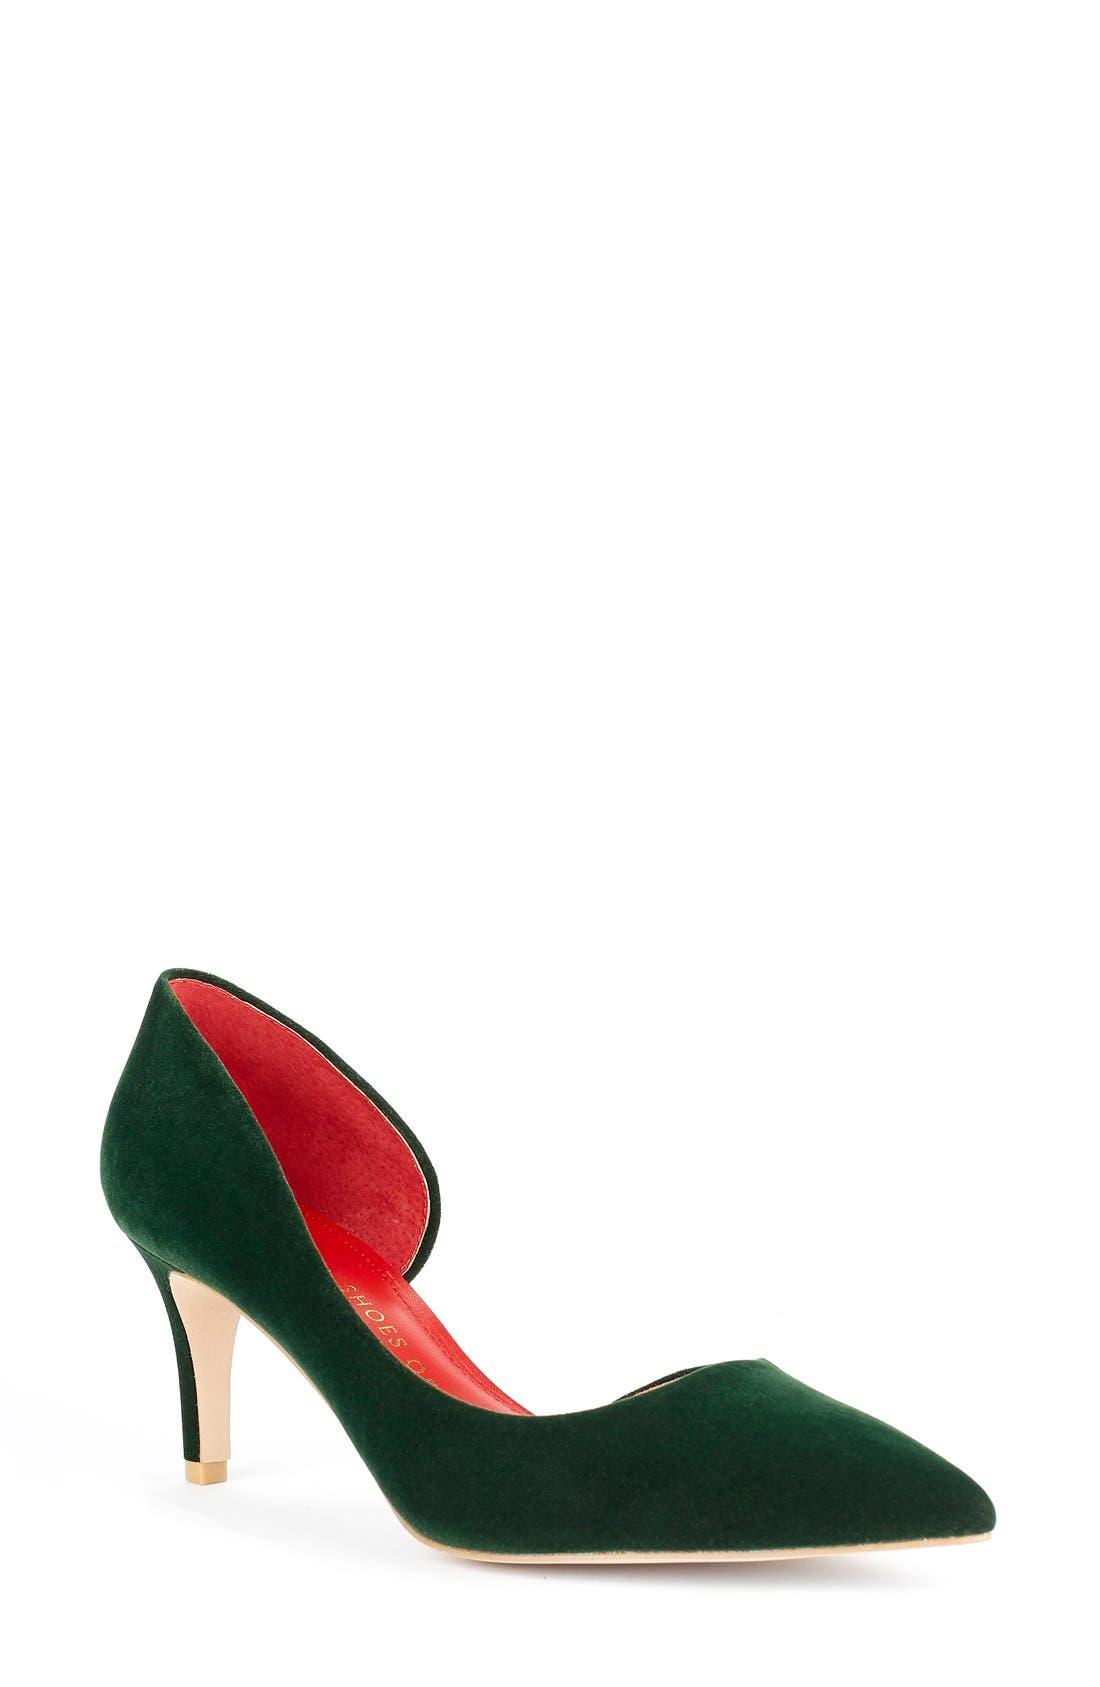 Shoes of Prey x Kim Jones La Dolce Vita Collection Half d'Orsay Pump (Women)